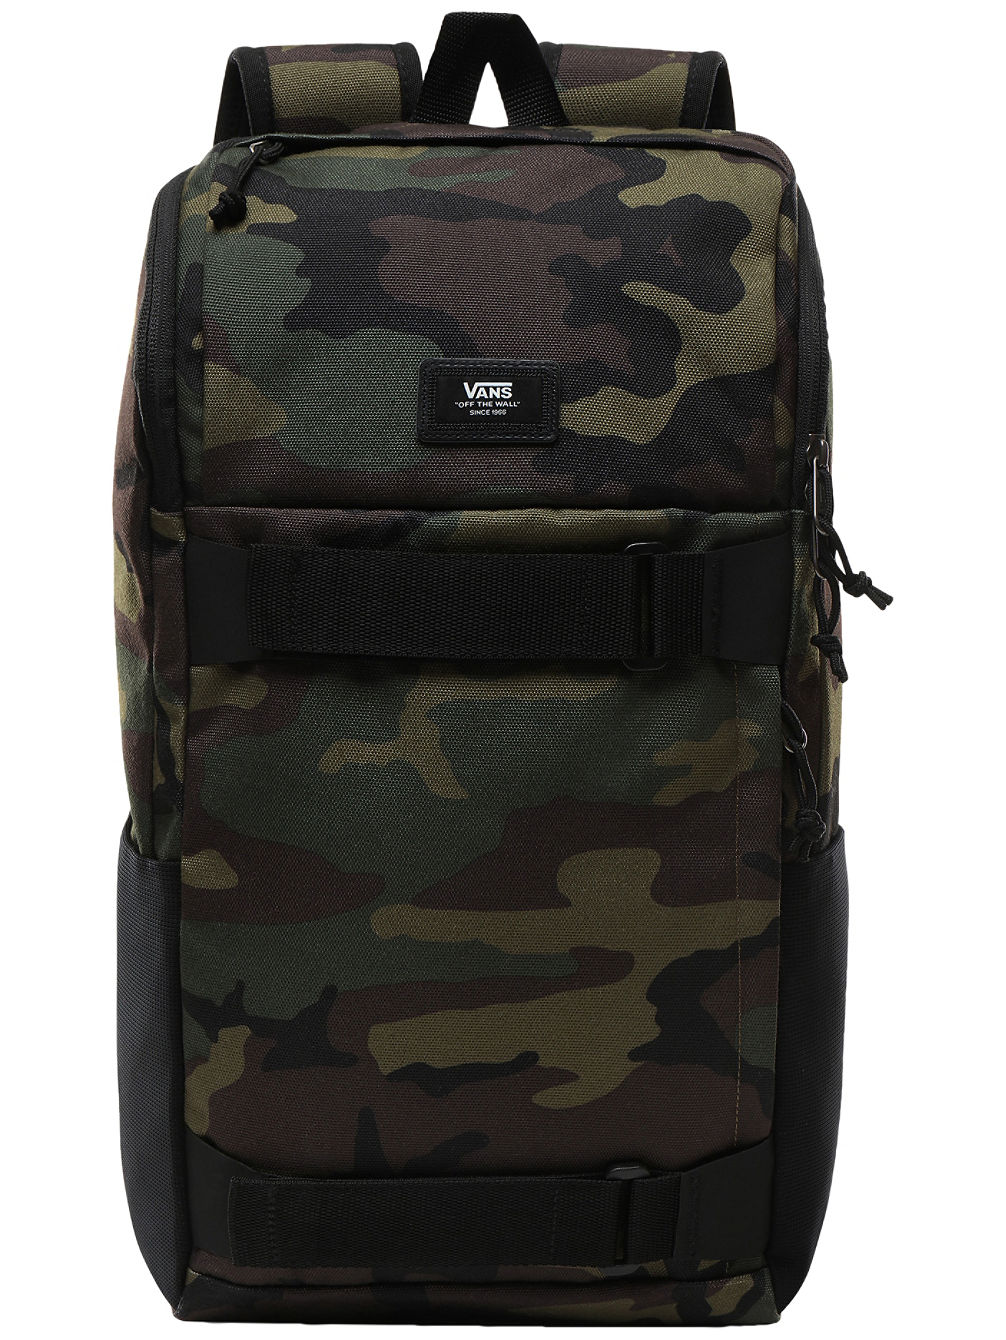 840e621720a0 Obstacle Skate Backpack